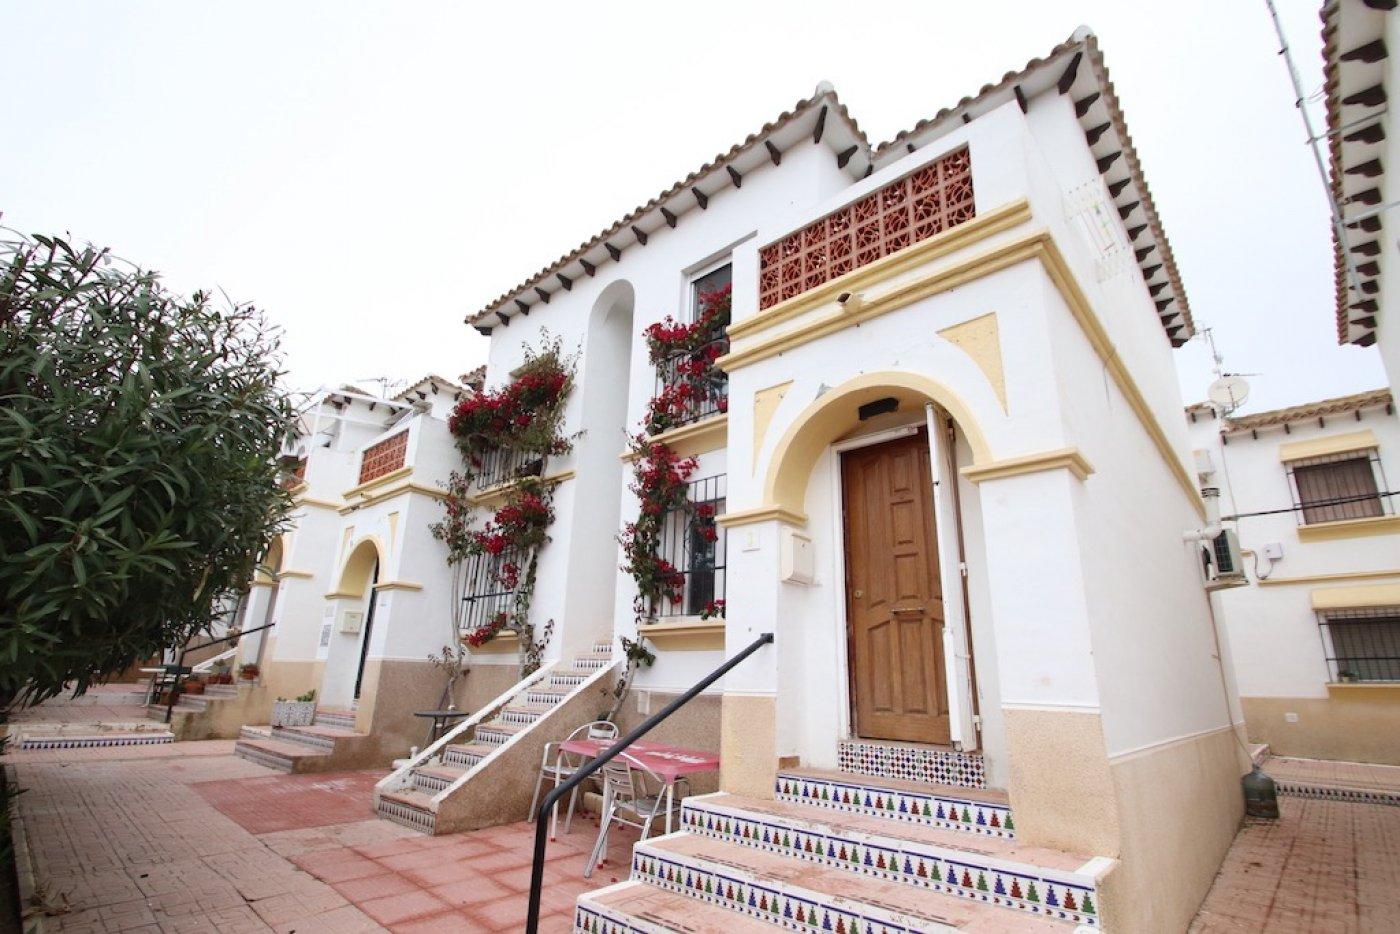 Appartement - Bestaande bouw - San Miguel de Salinas - Villamartin